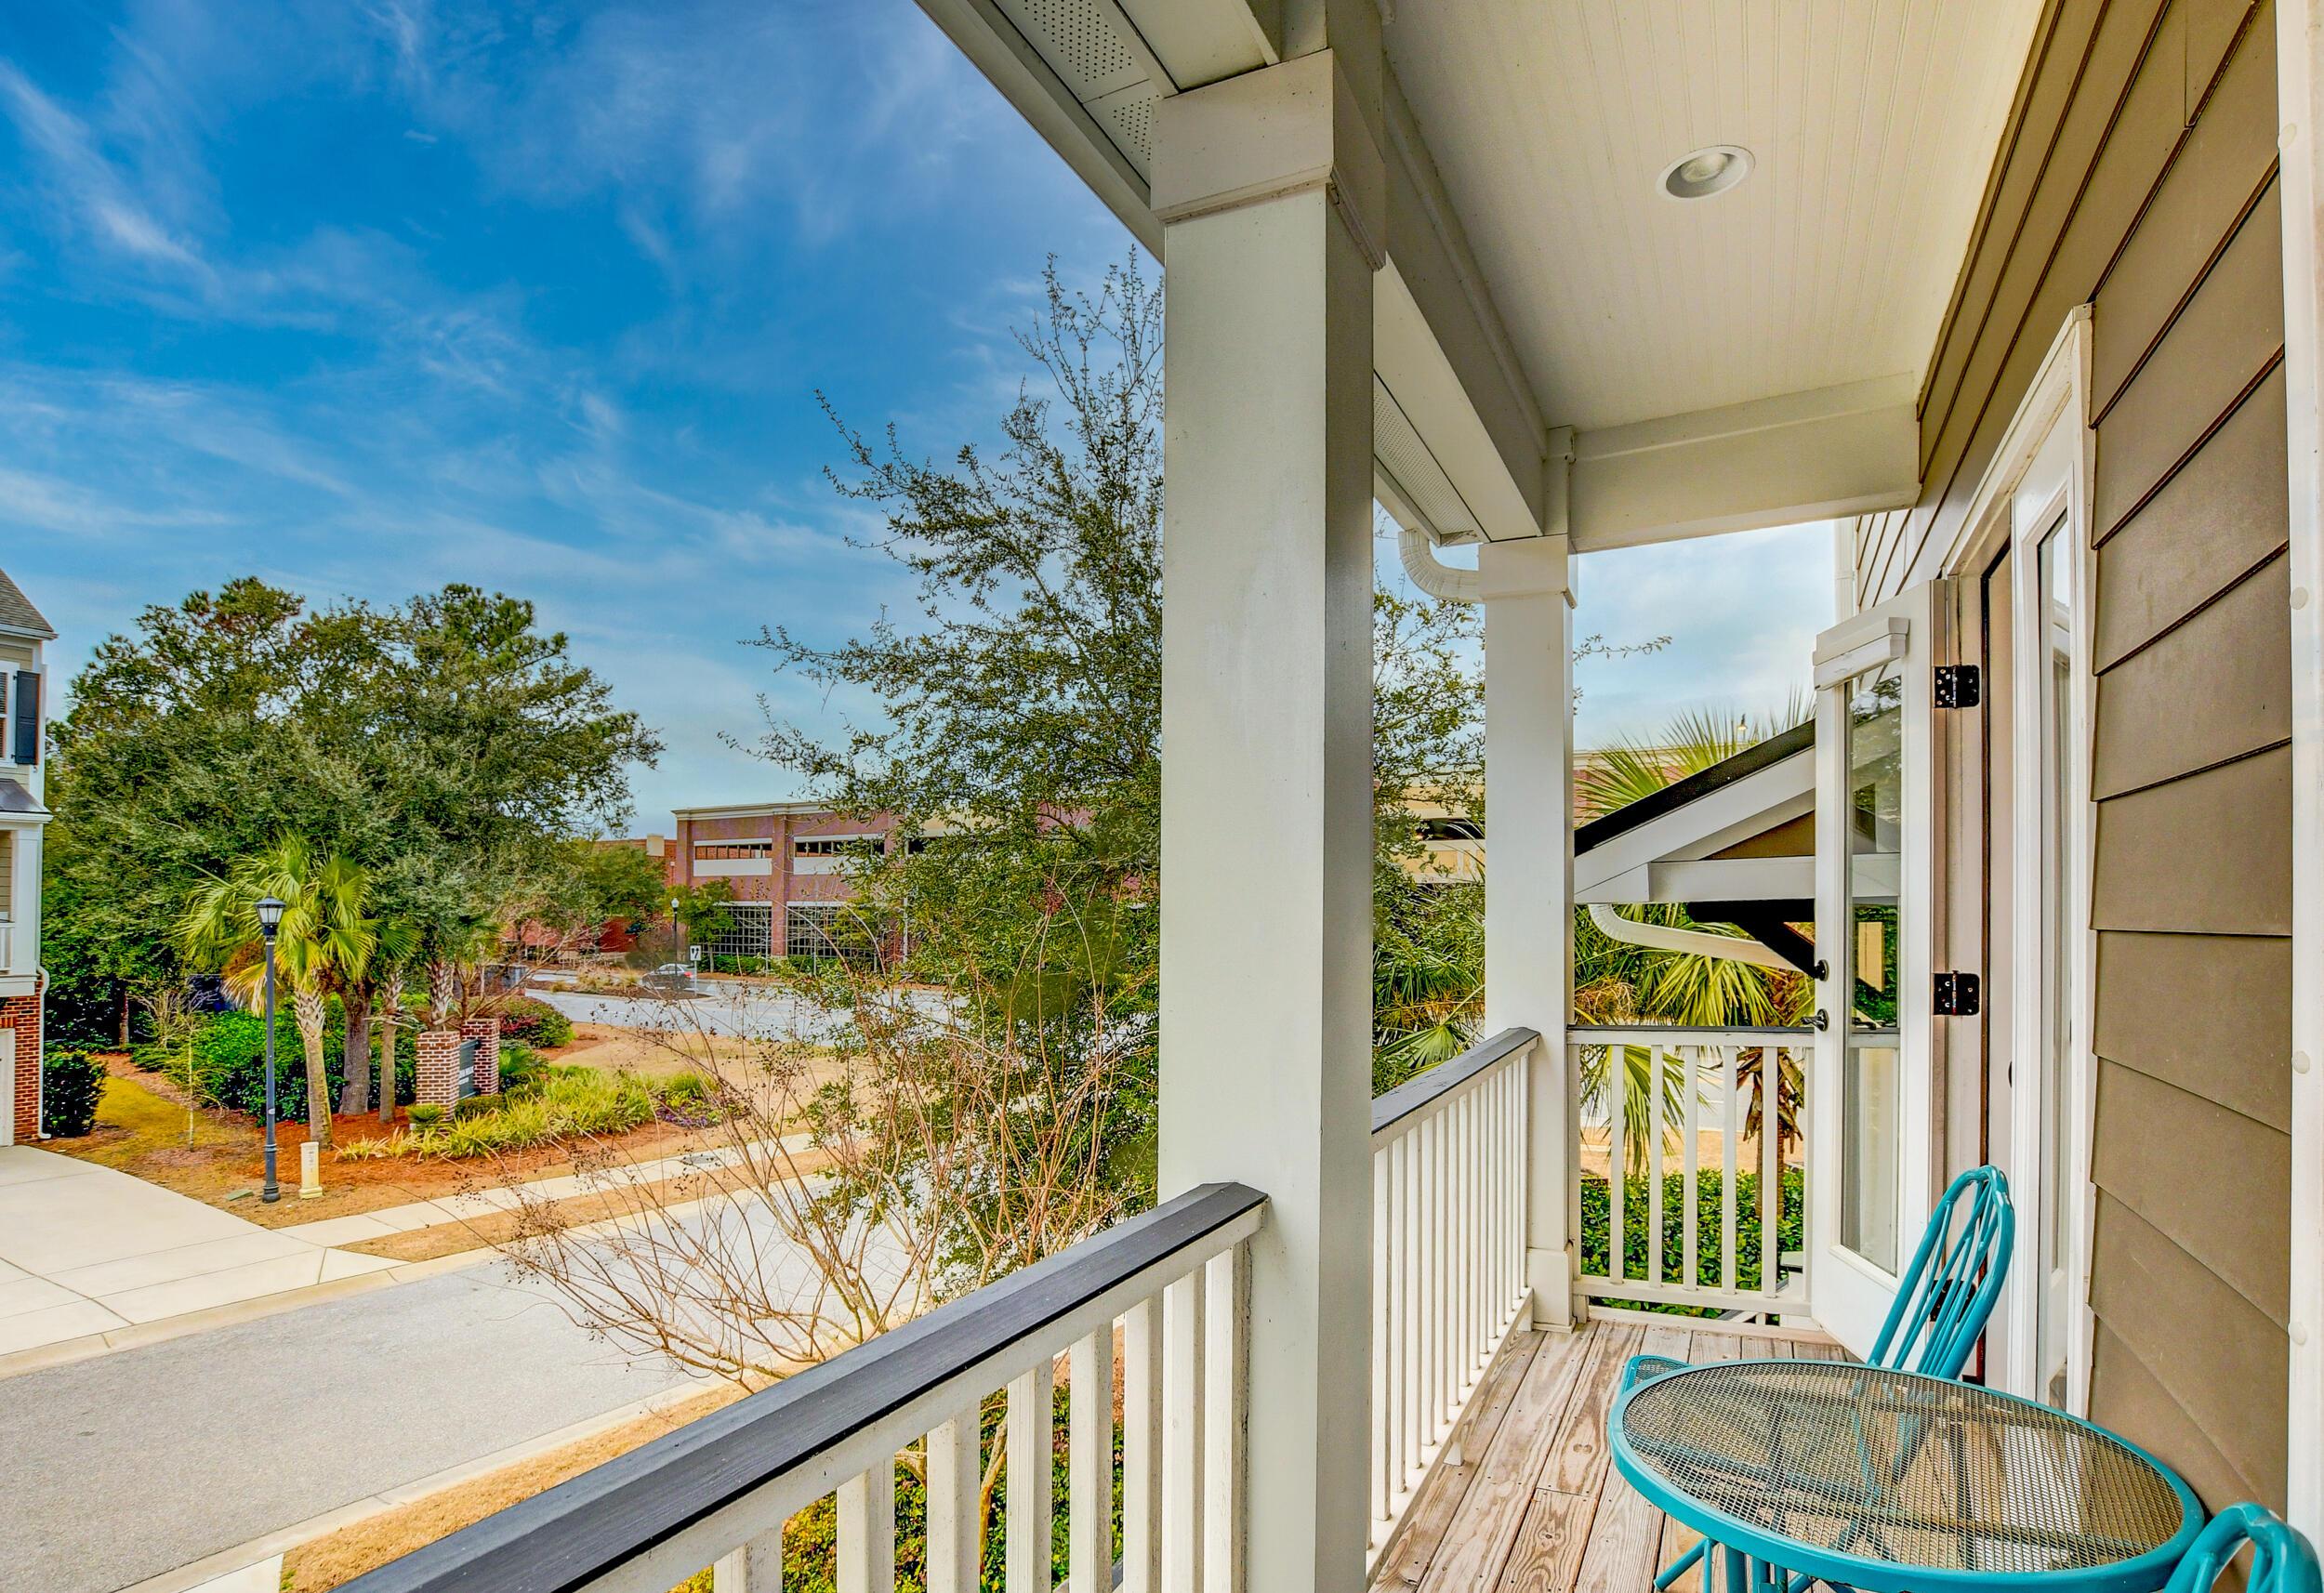 Carolina Walk Homes For Sale - 1876 Carolina Towne, Mount Pleasant, SC - 10